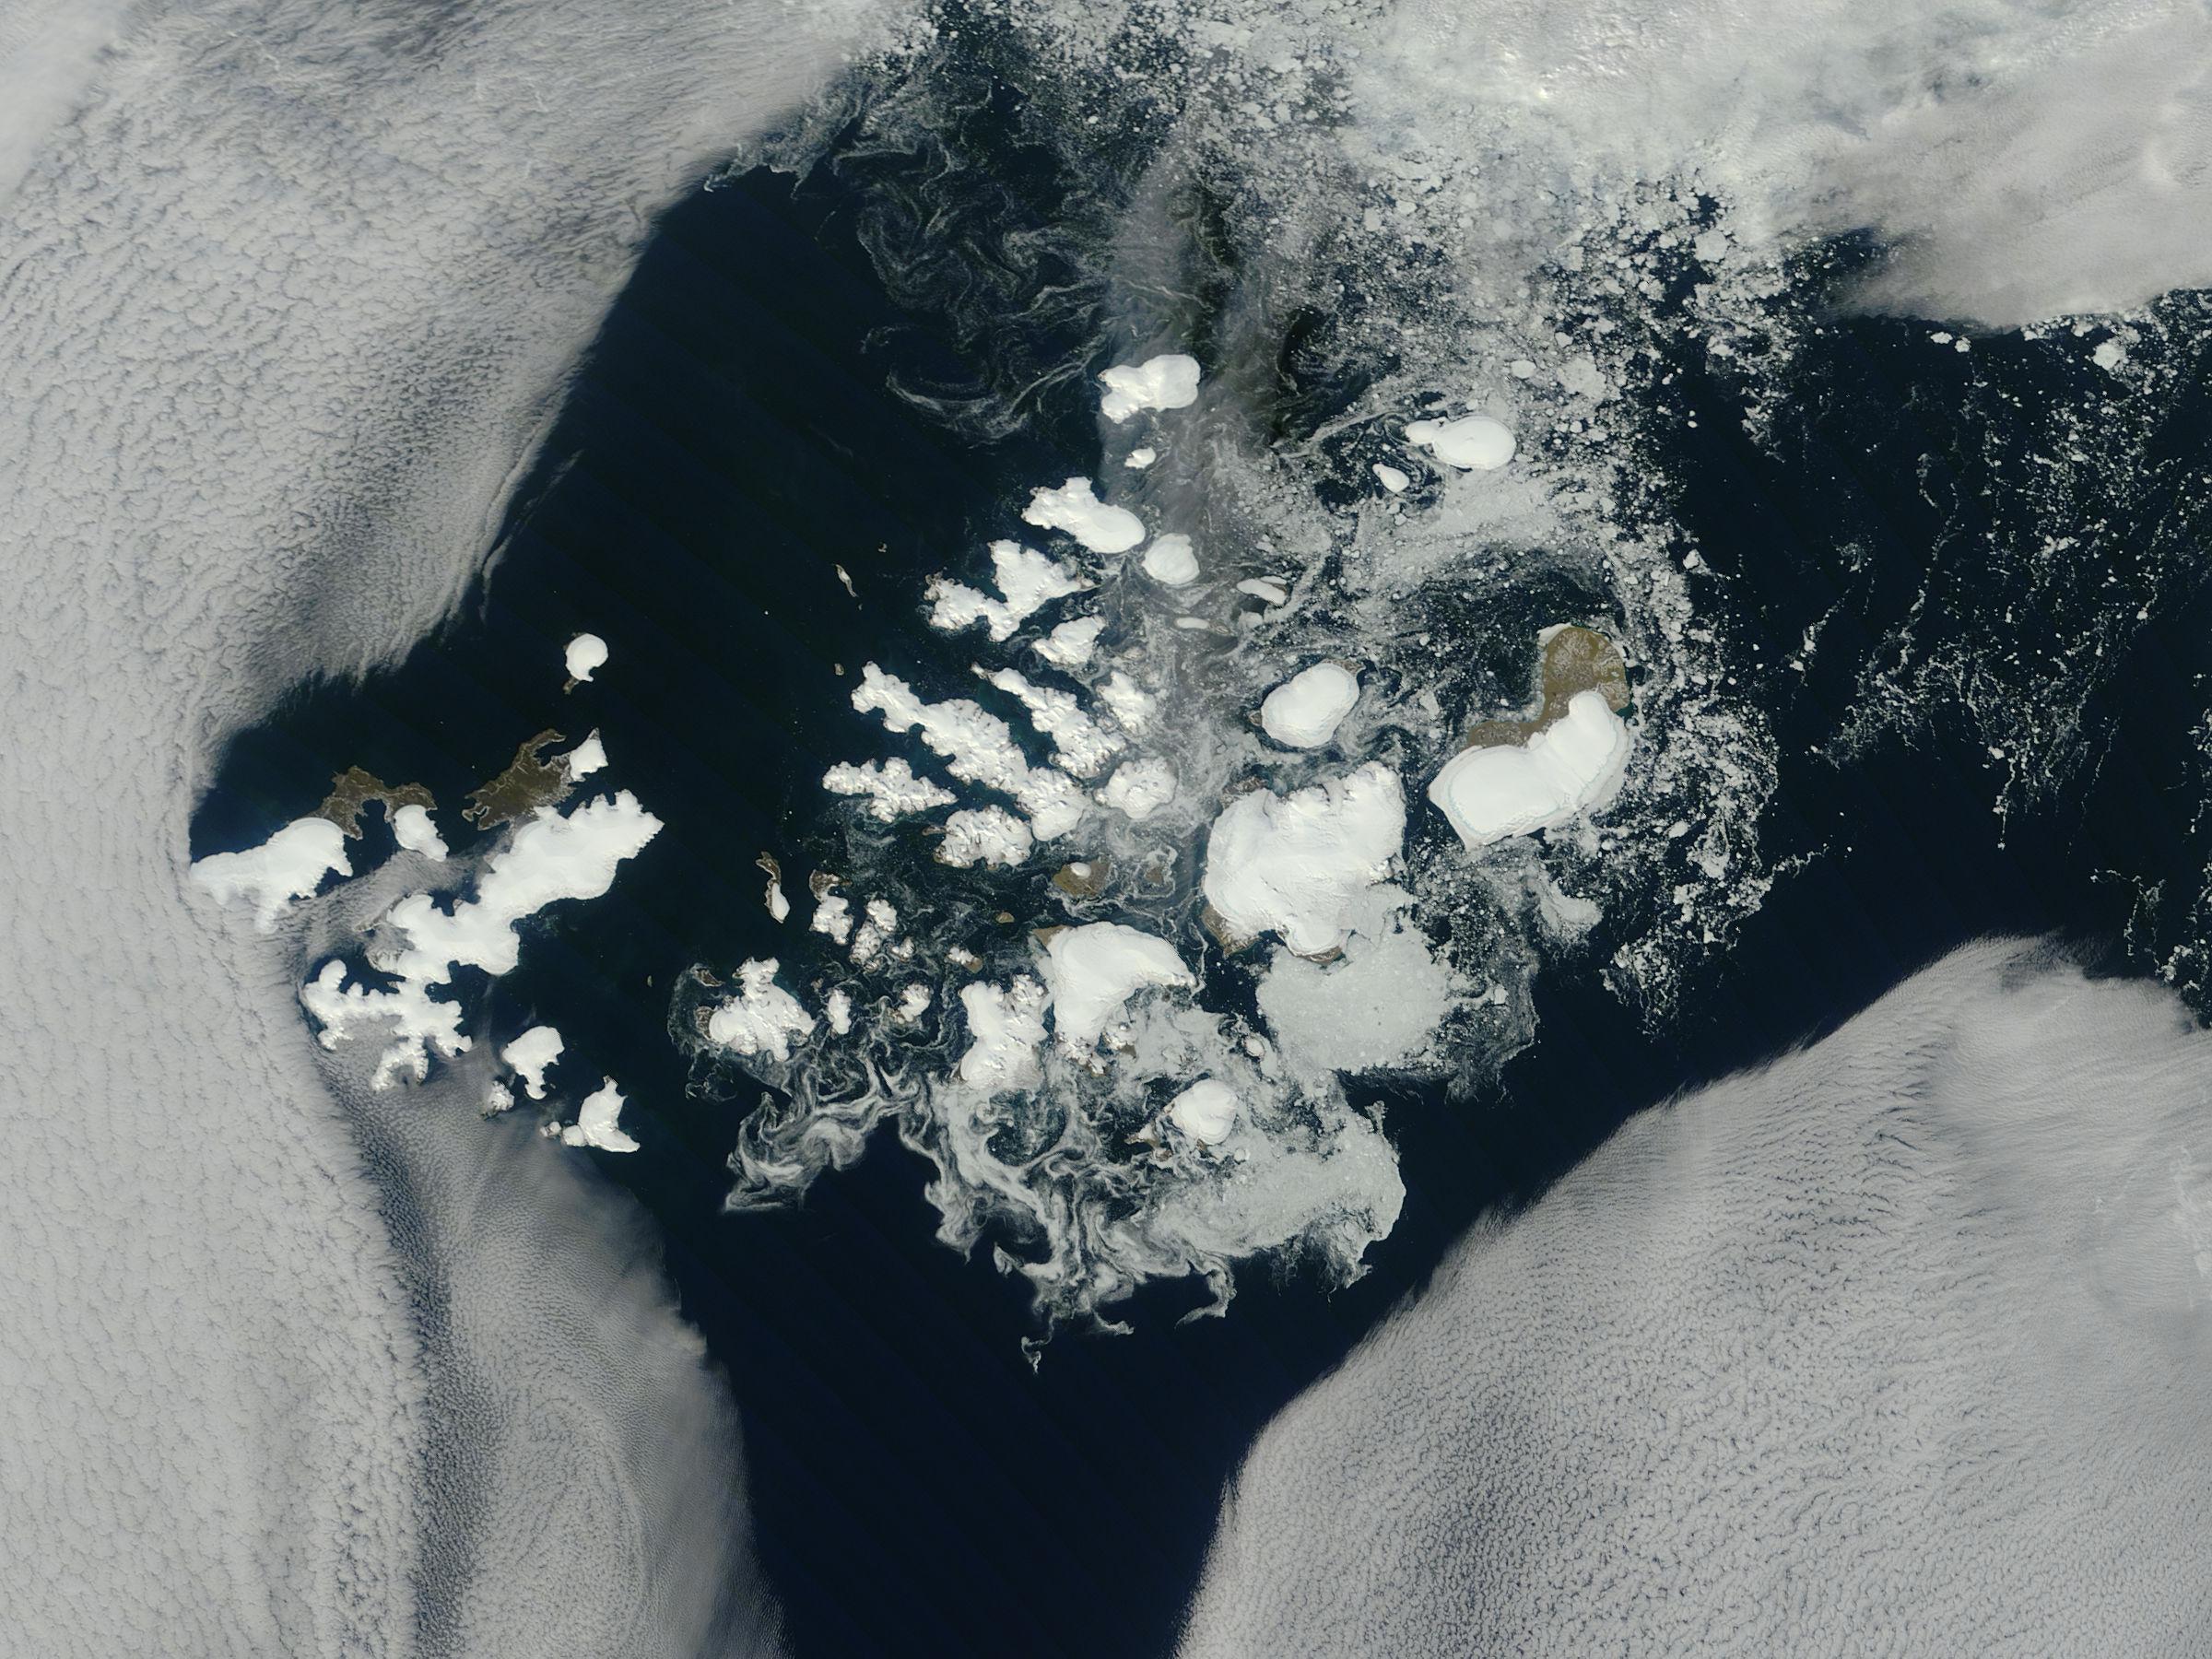 More tourists venture to Russia's remotest Arctic coast